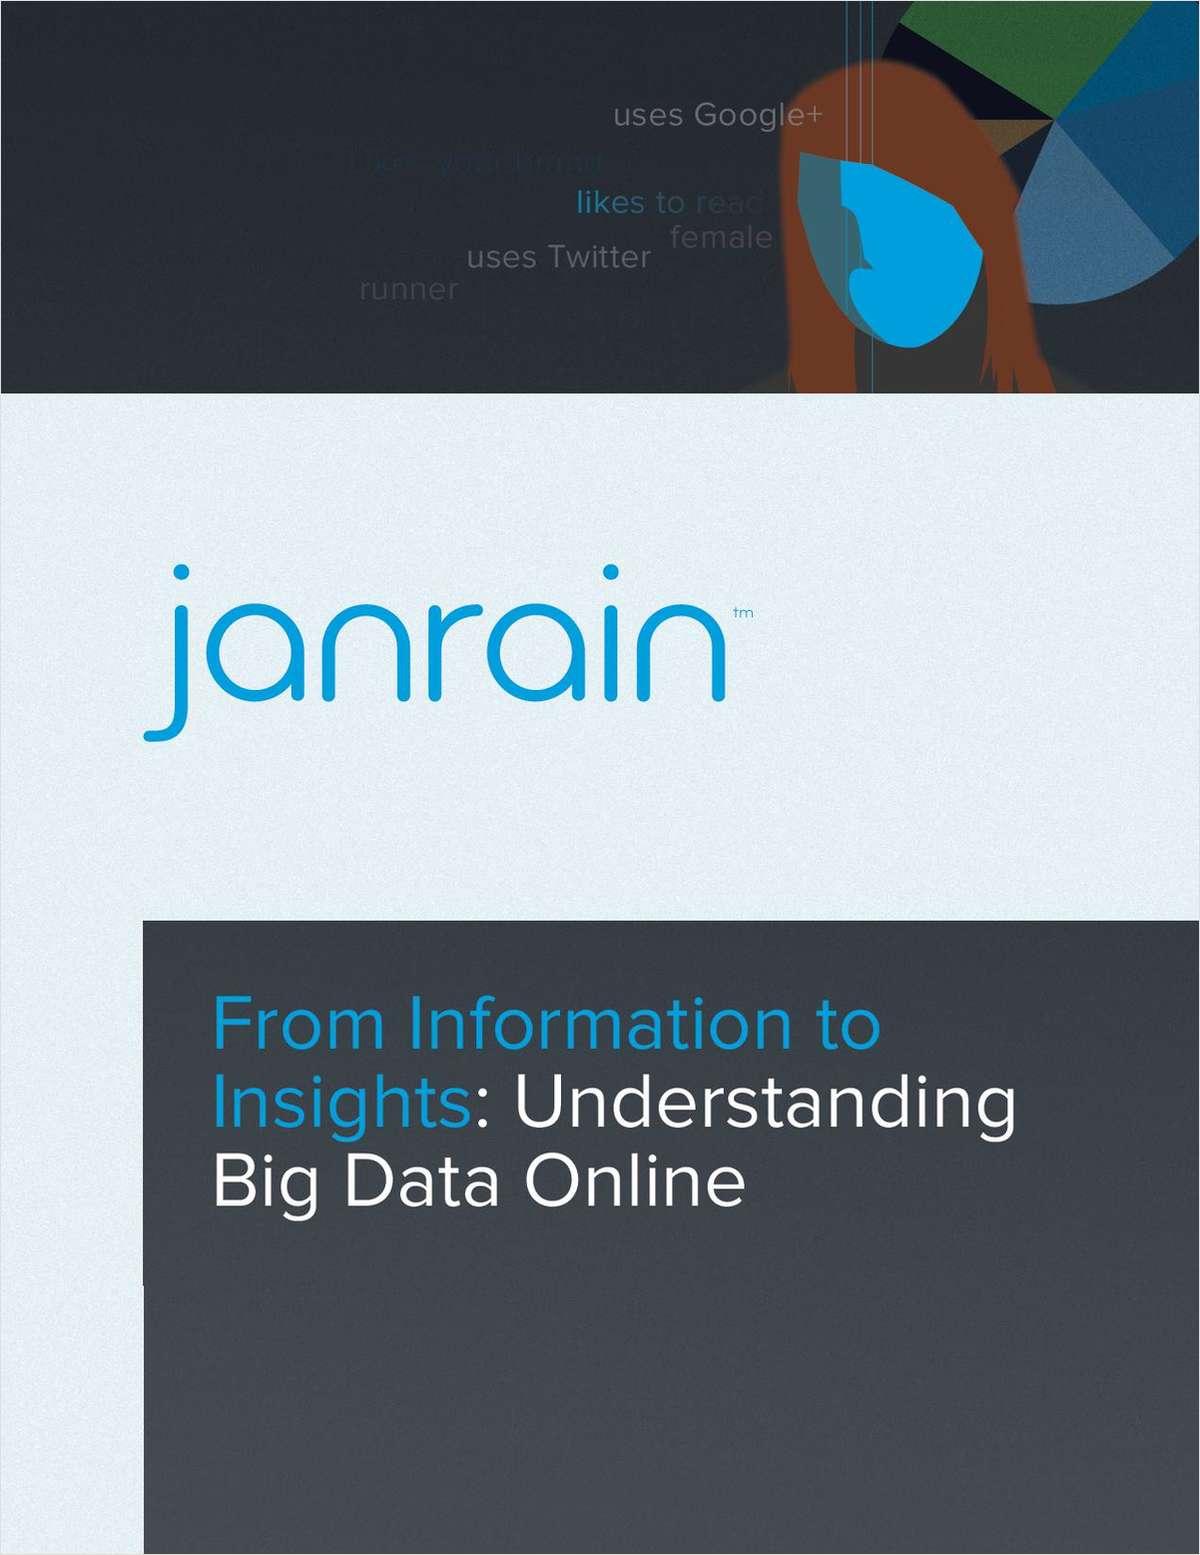 From Information to Insights -- Understanding Big Data Online